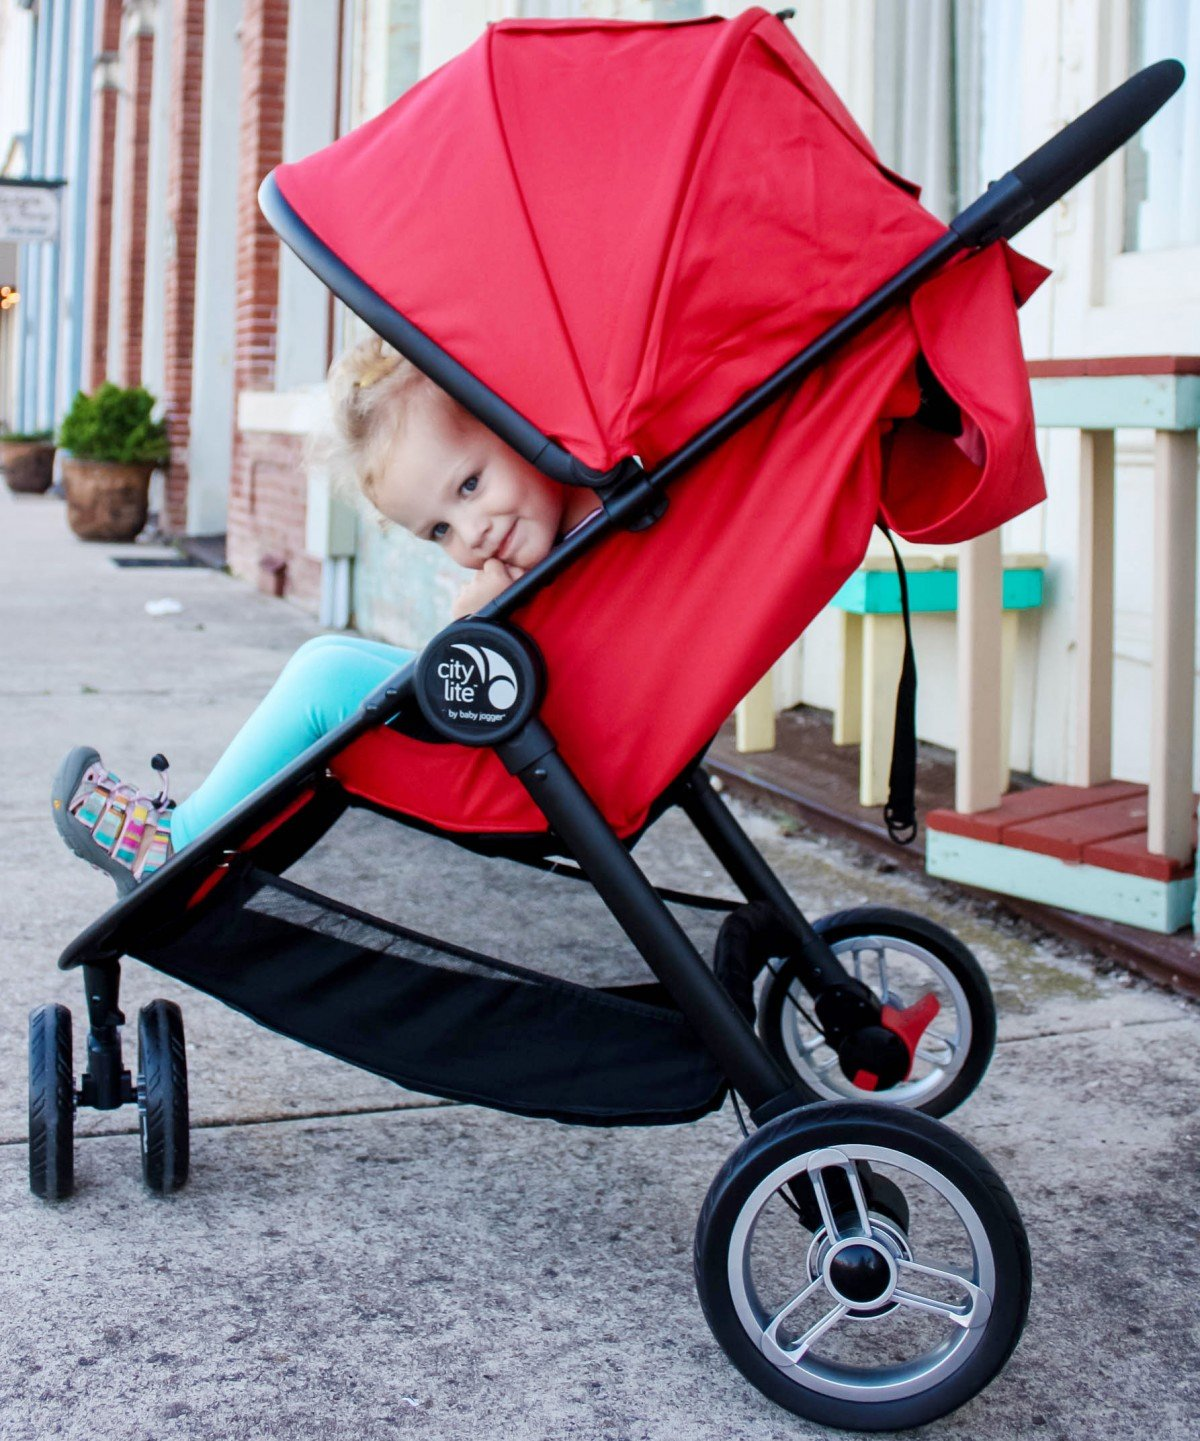 City Lite Stroller-3